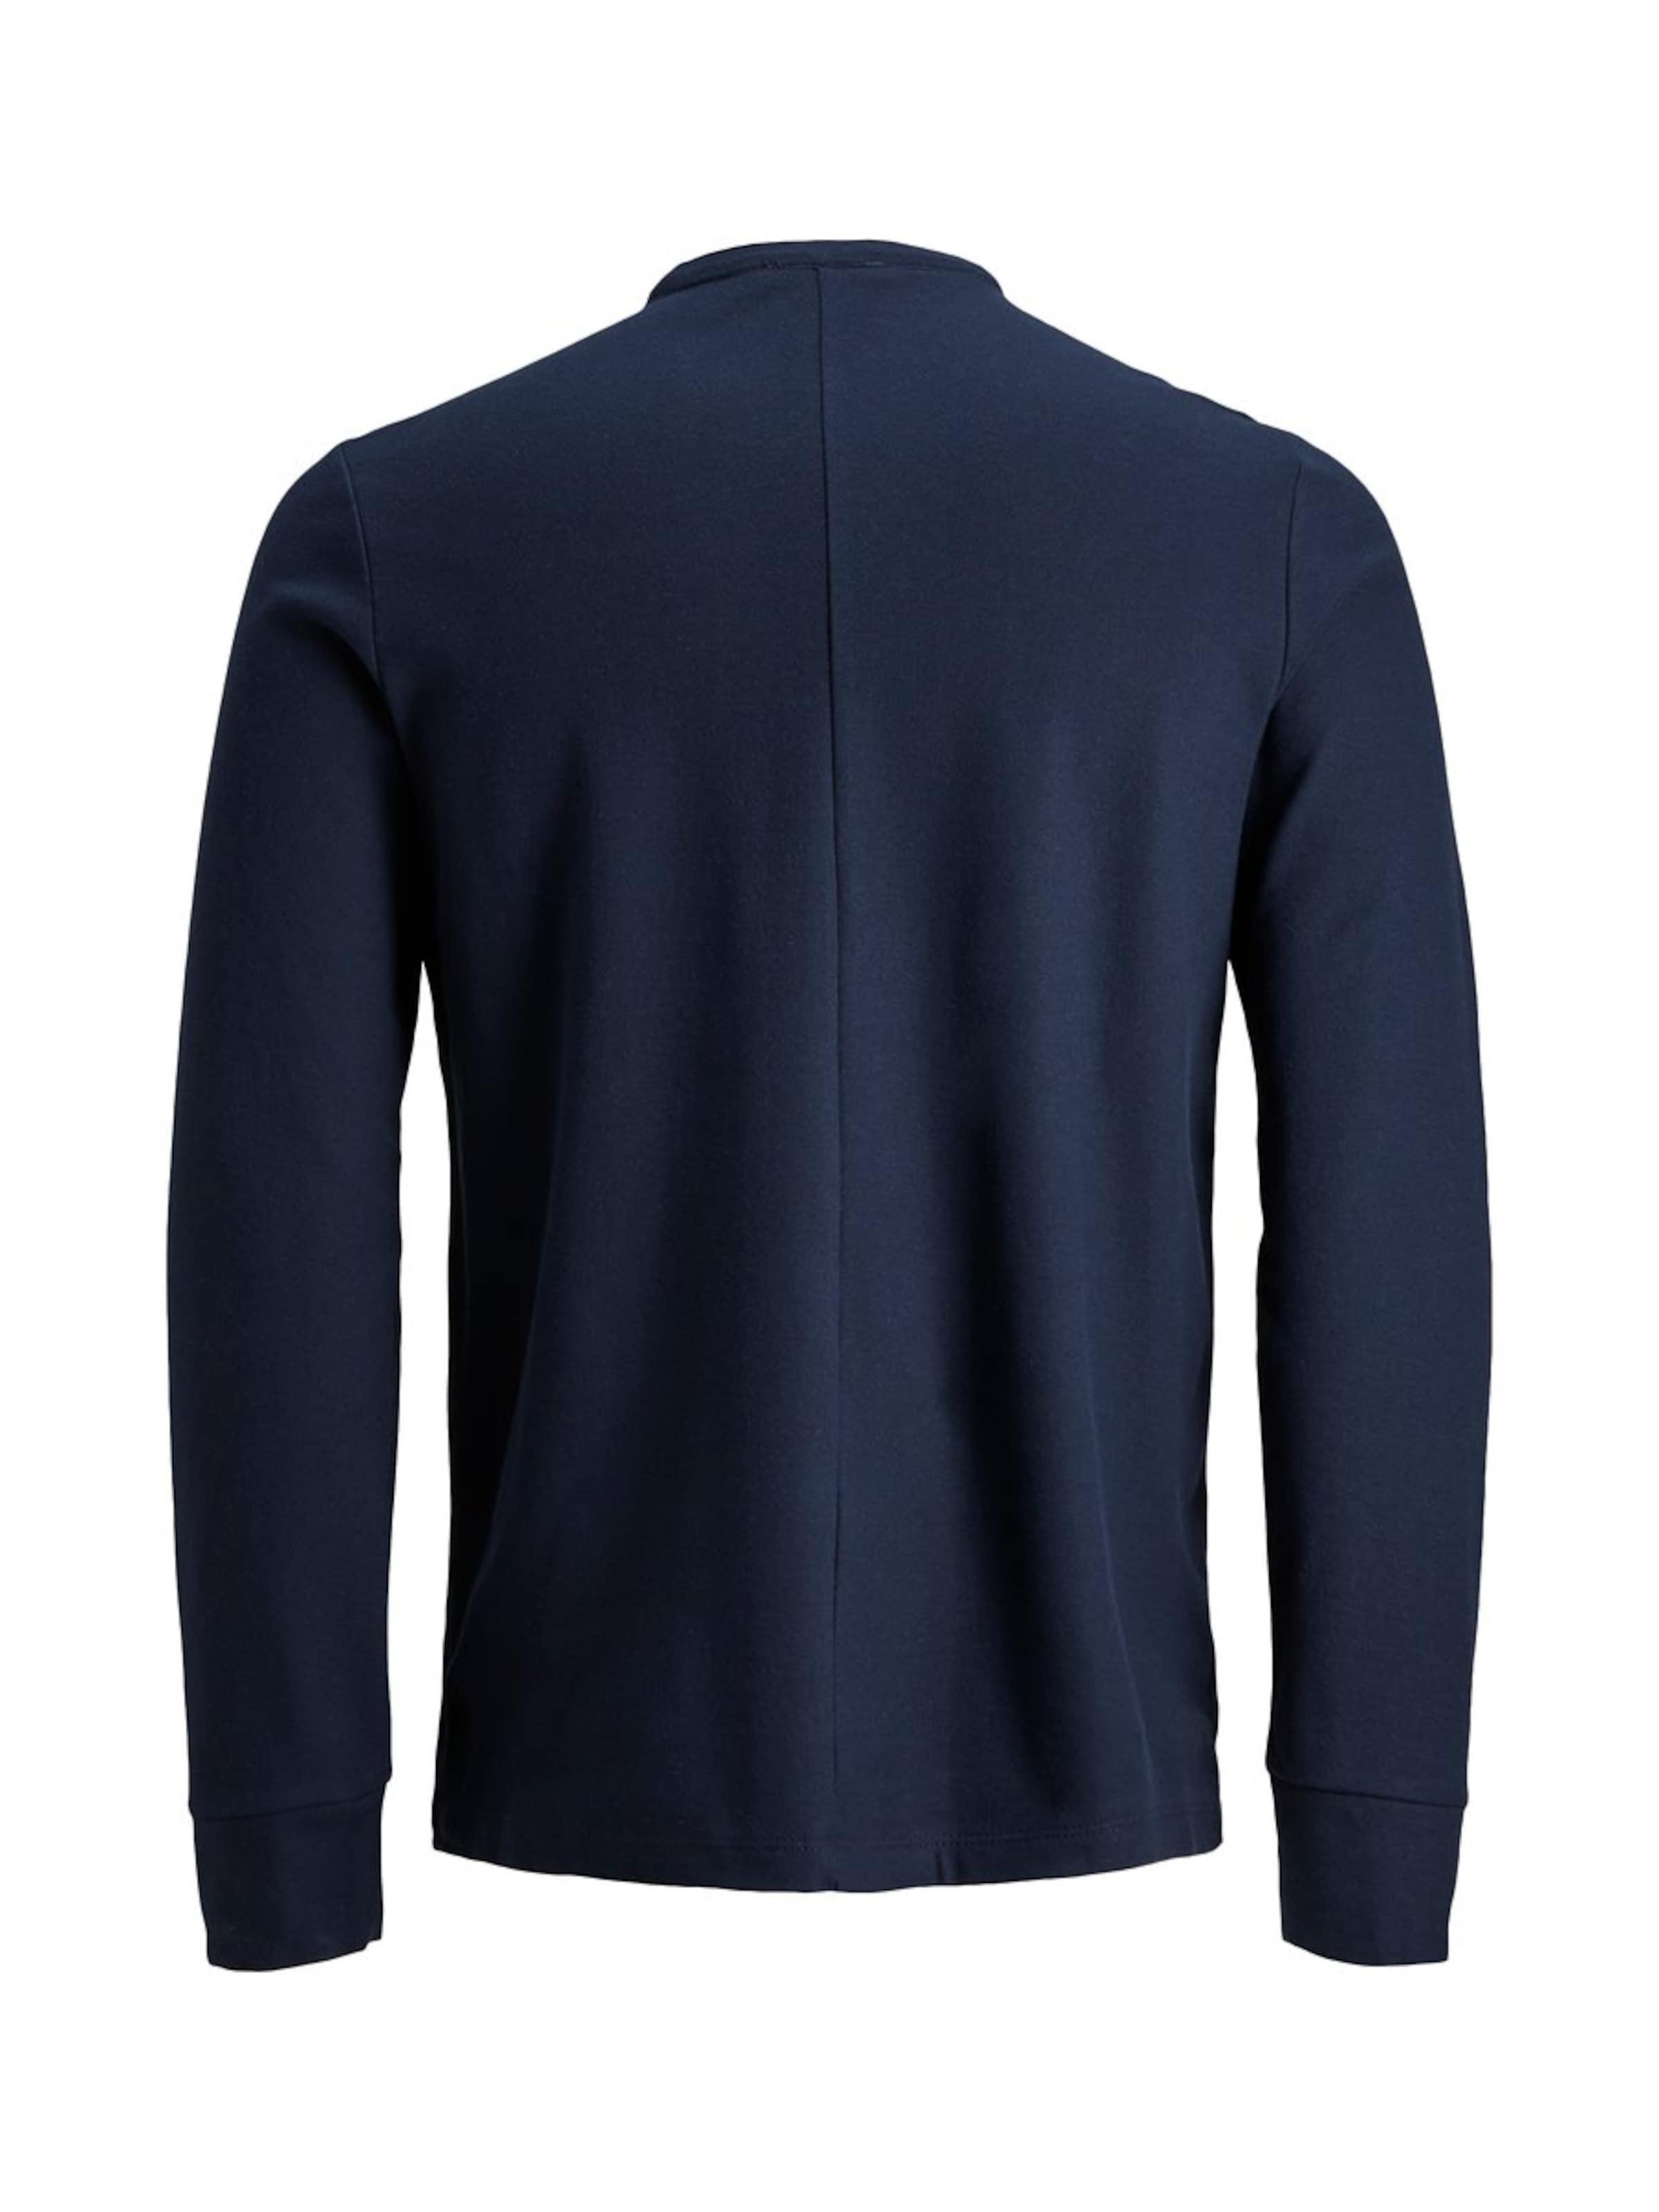 Chemise Jones Marine En Bleu Jackamp; 'workwear' TKJcl13F